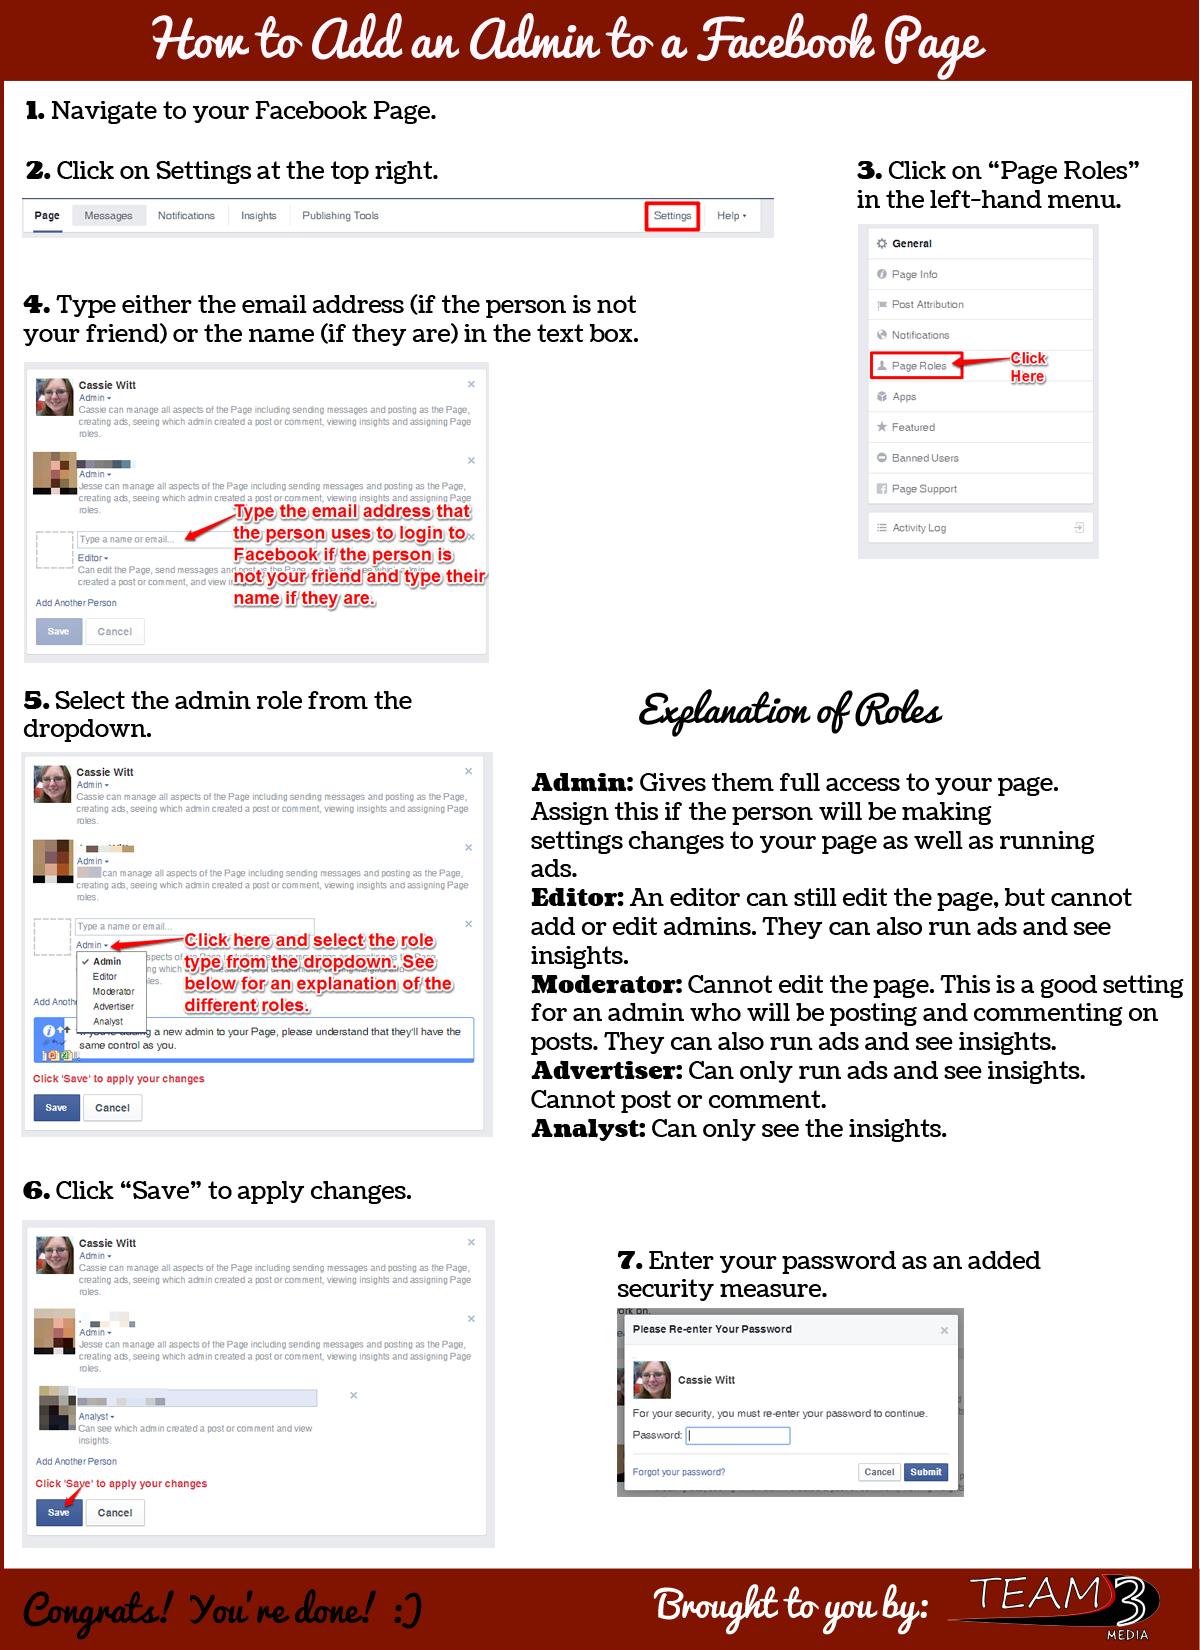 FB-HowToAddAnAdminToAFacebookPage